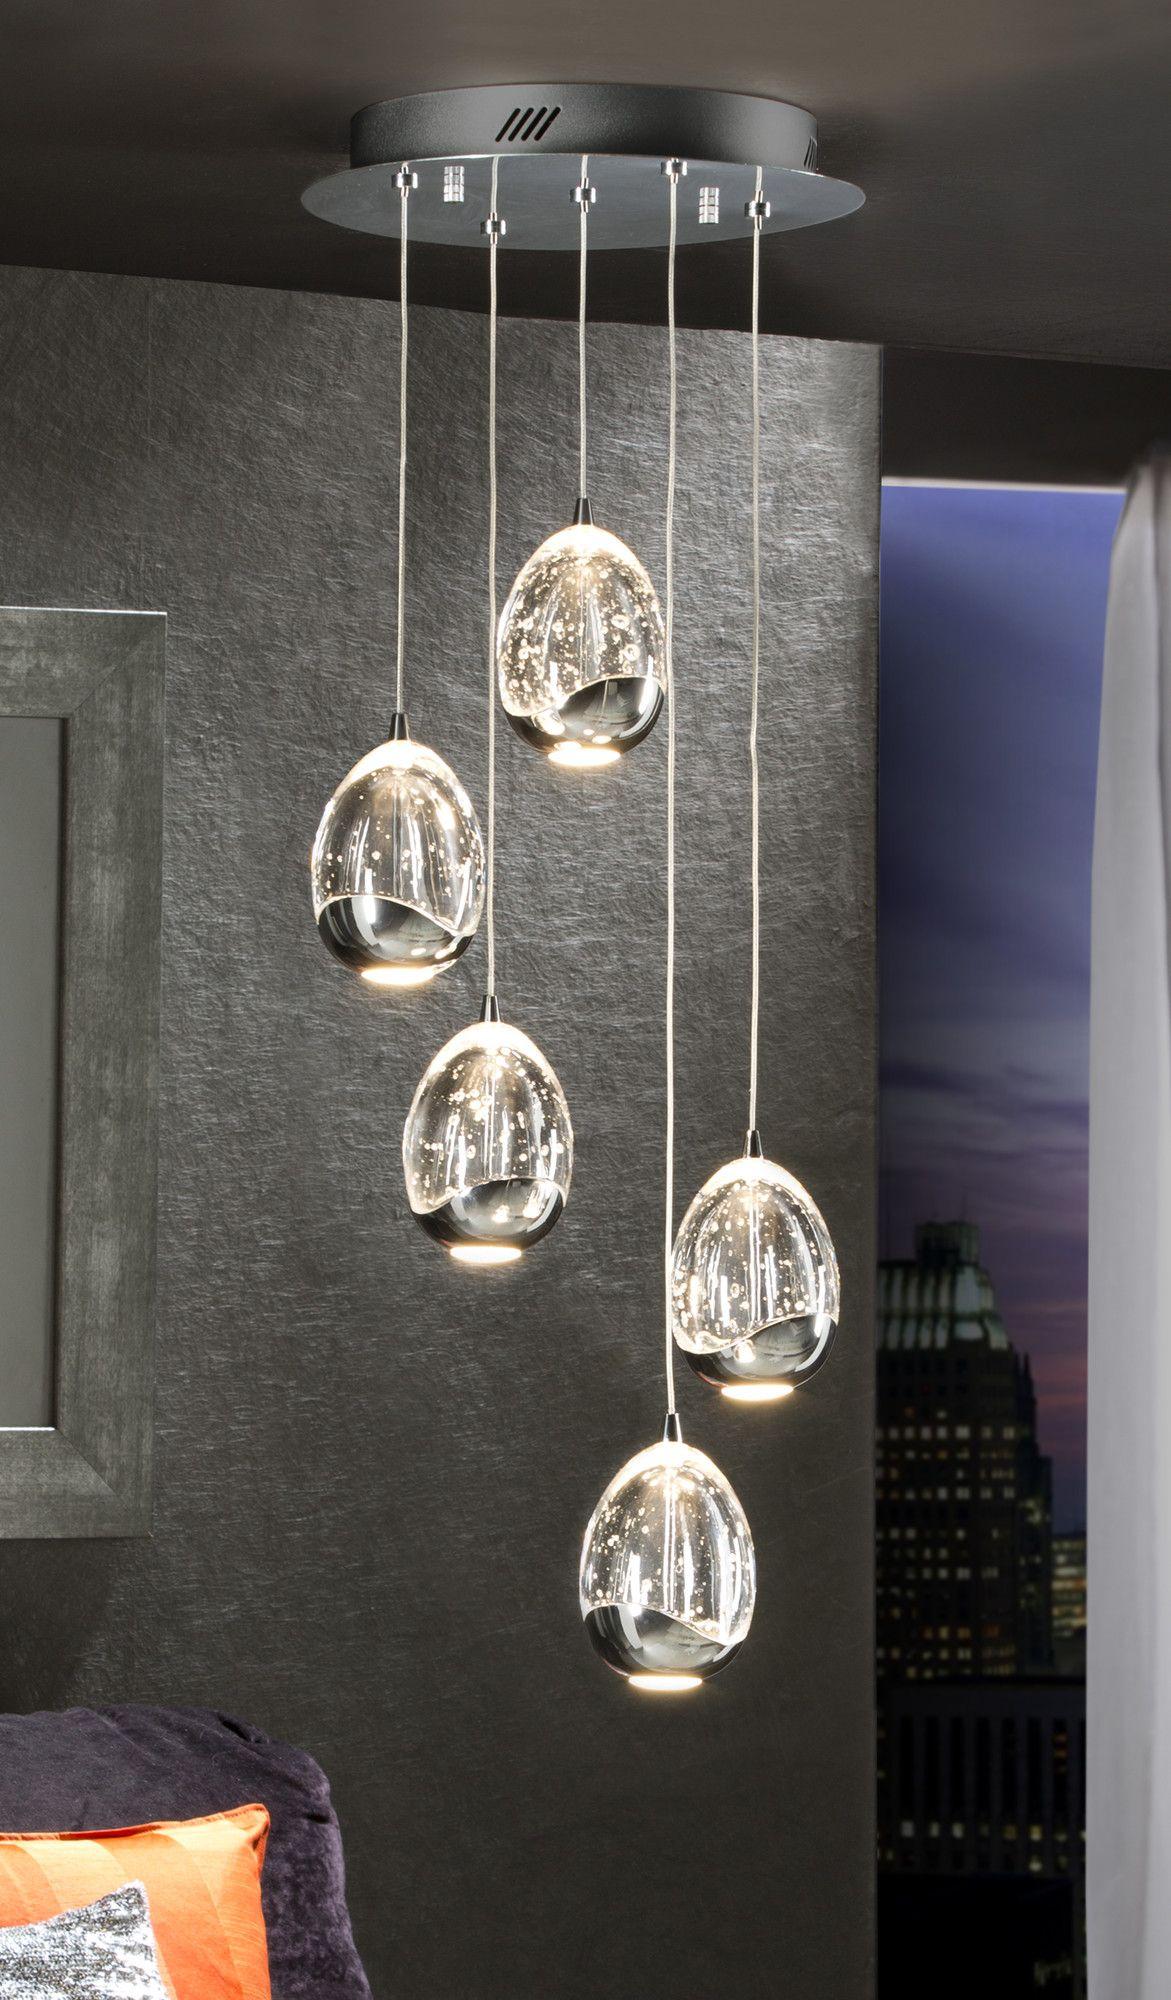 5 Rings LED Ceiling Light Fixture Crystal Chandelier Pendant Lights Lamparas De Techo Lustre Maison Modern Lighting for Living Room Bedroom Kitchen @